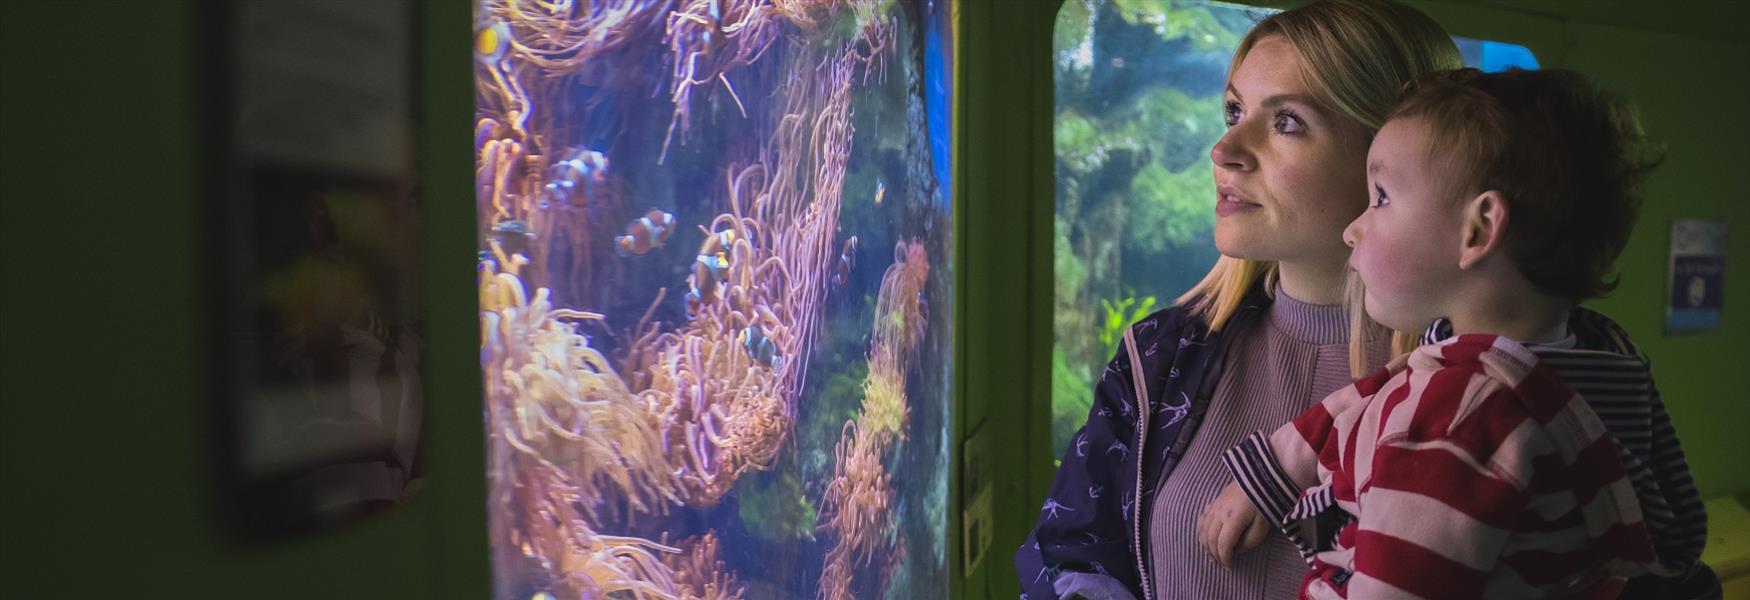 A family at the National Marine Aquarium Plymouth